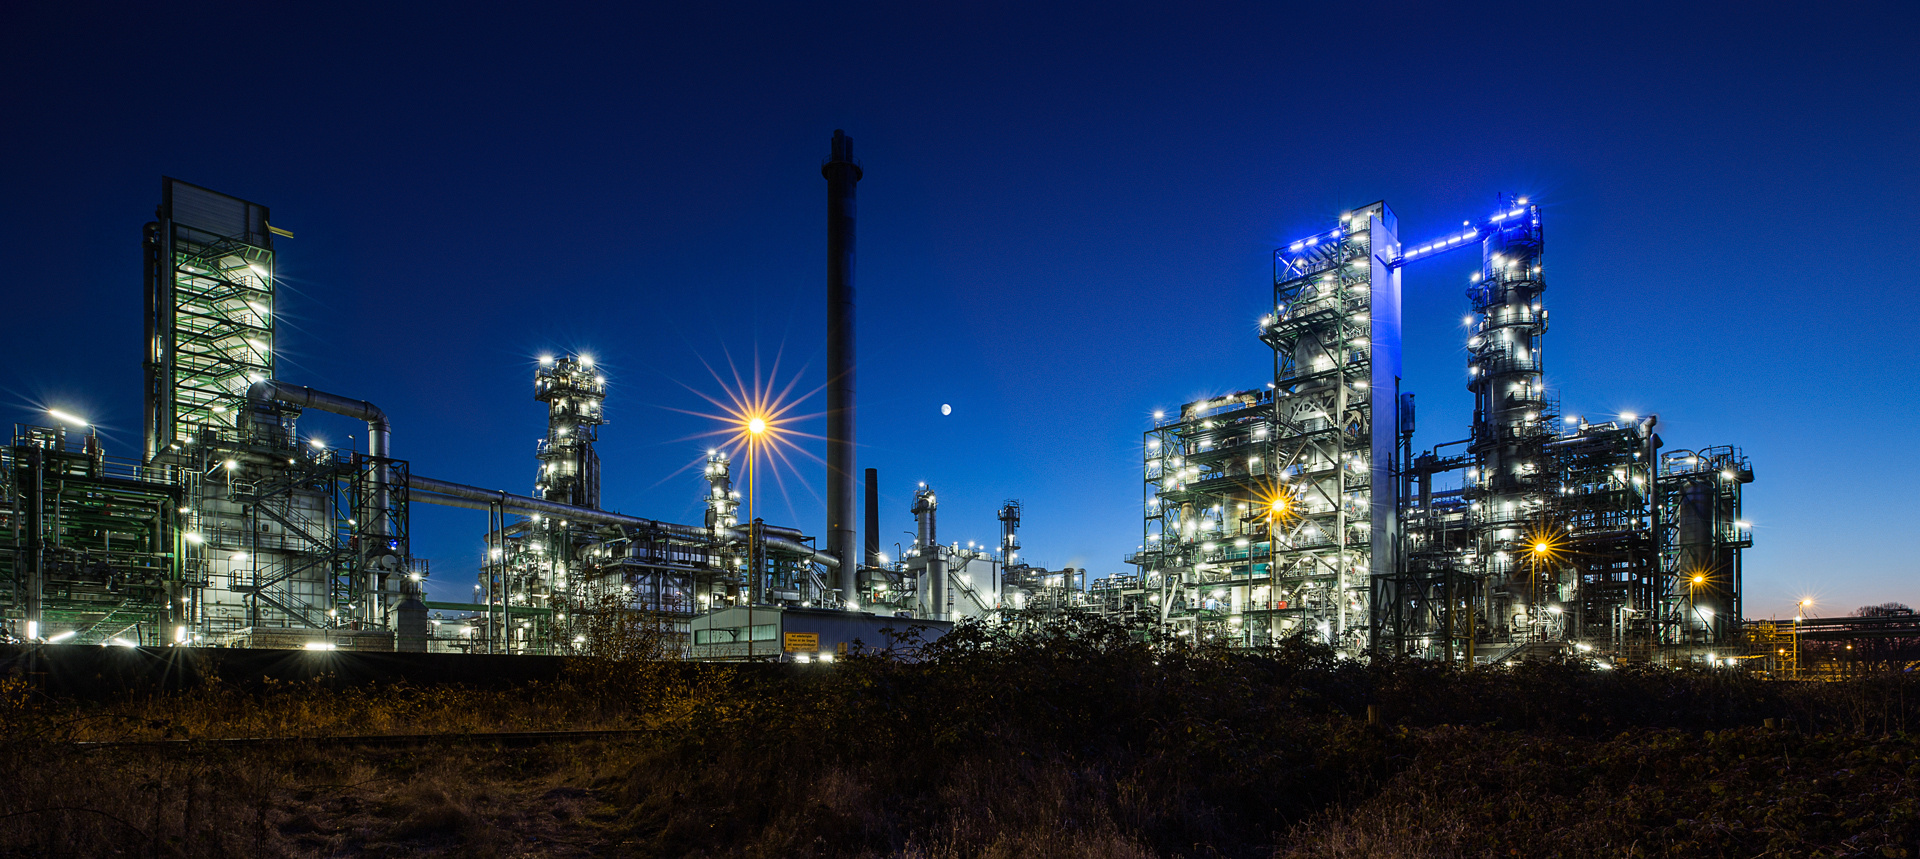 BP Refining & Petrochemicals GmbH